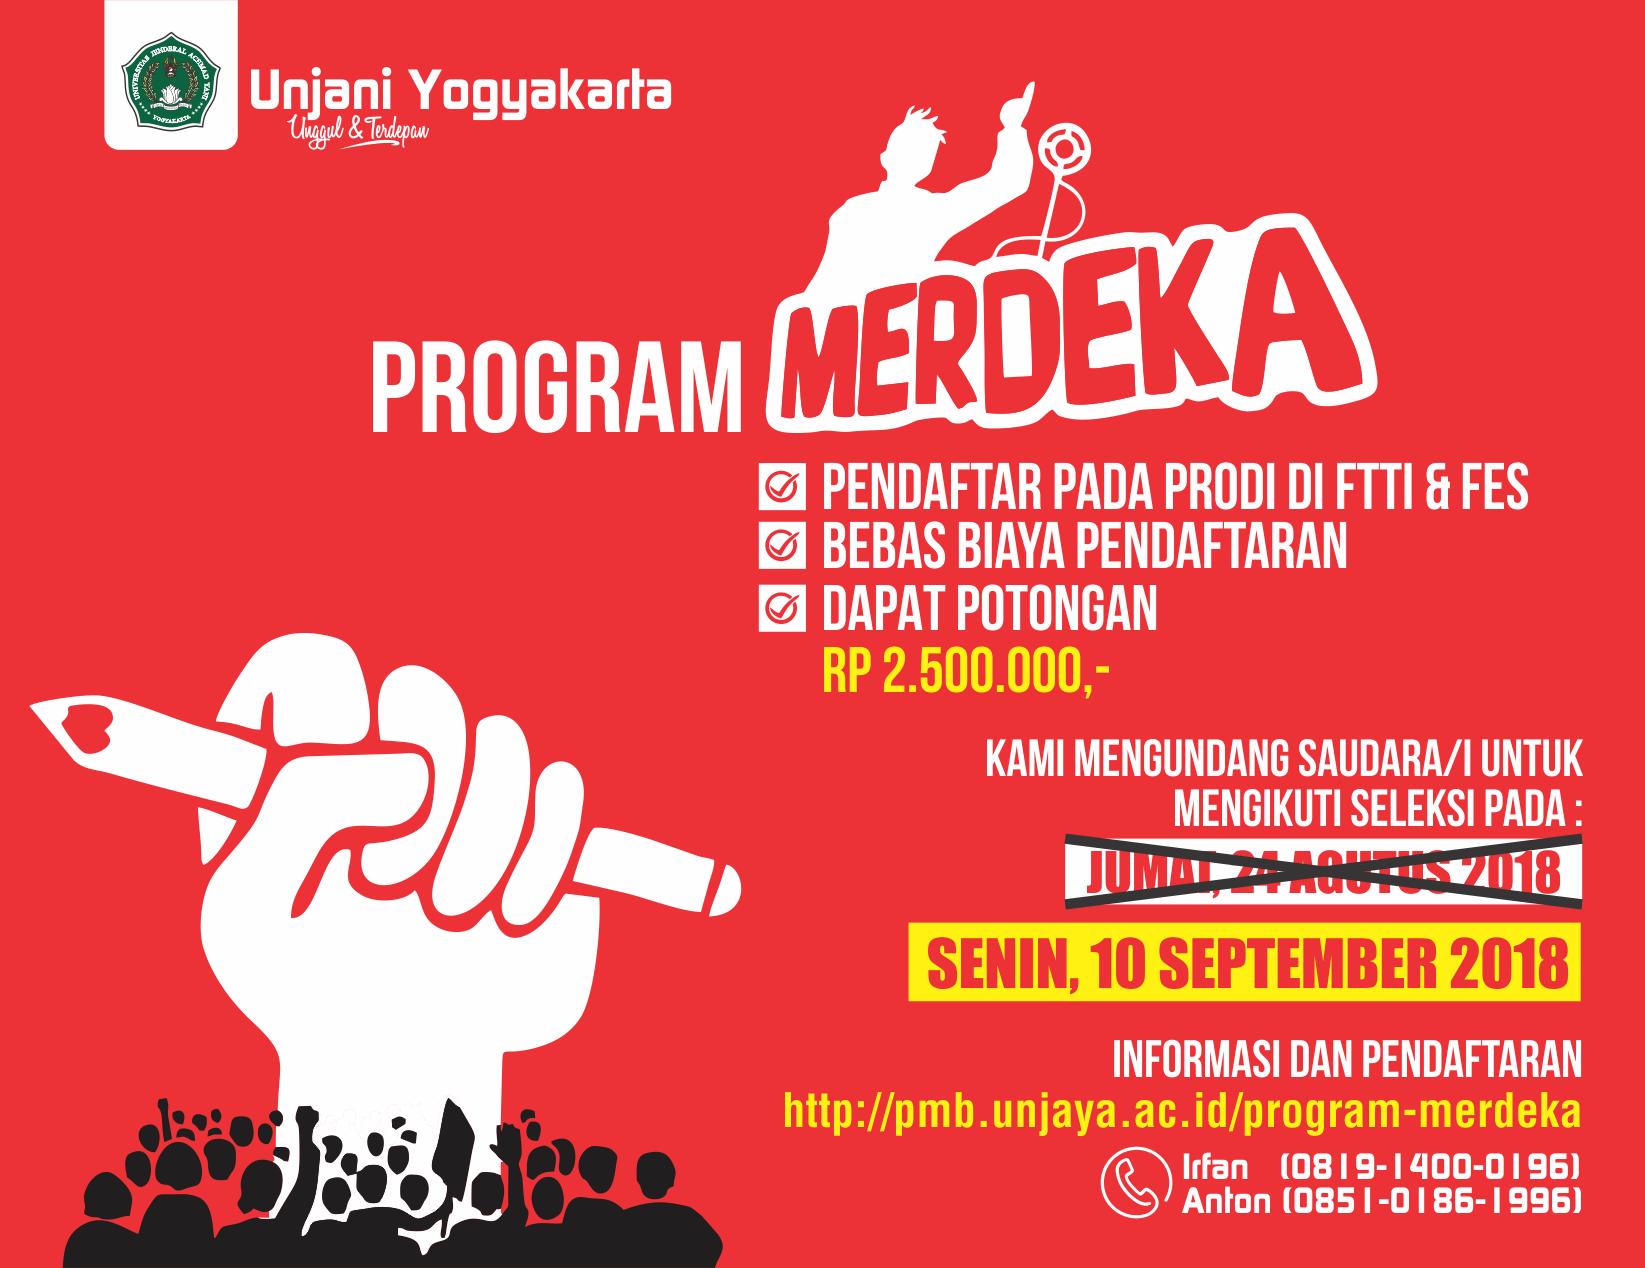 Program Merdeka Unjani Yogyakarta